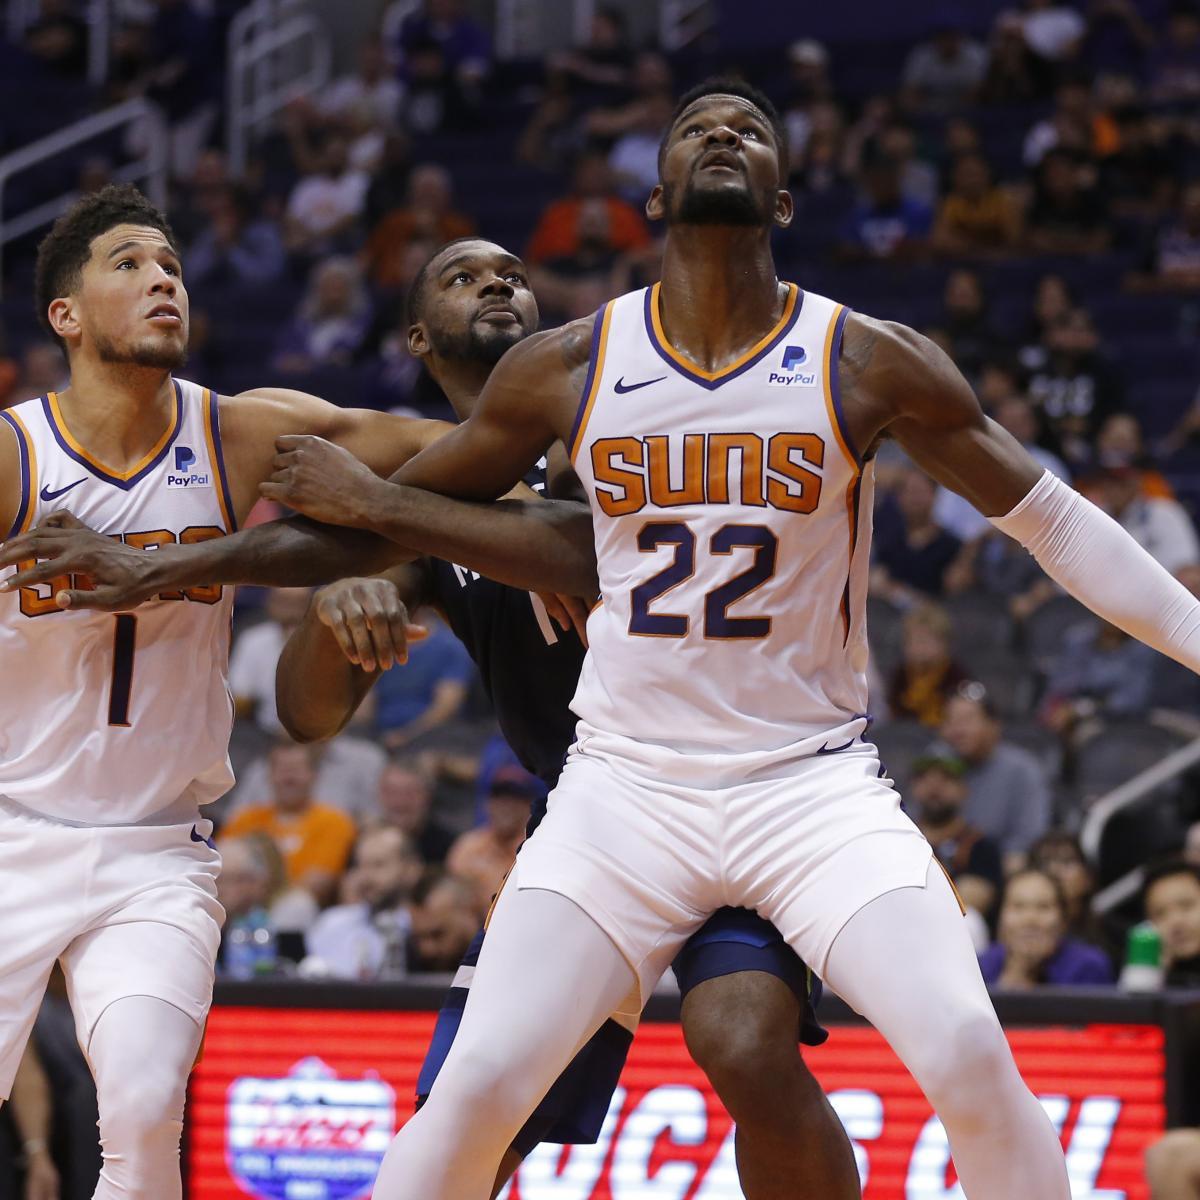 Devin Booker Beats Suns Teammate Deandre Ayton to Win NBA 2K20 Championship